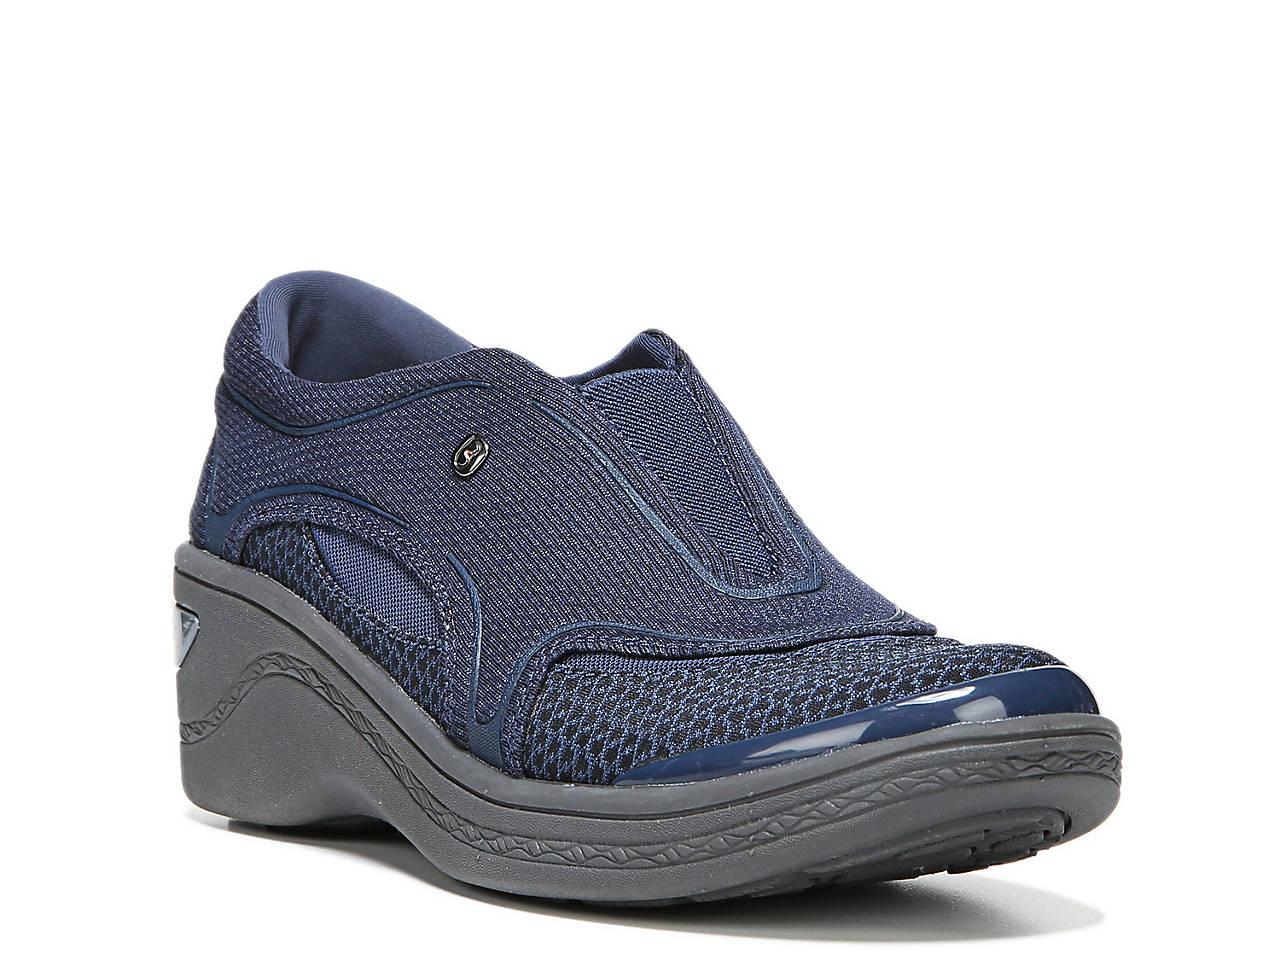 a28b07a0cb7 BZees Derive Slip-On Sneaker Women s Shoes